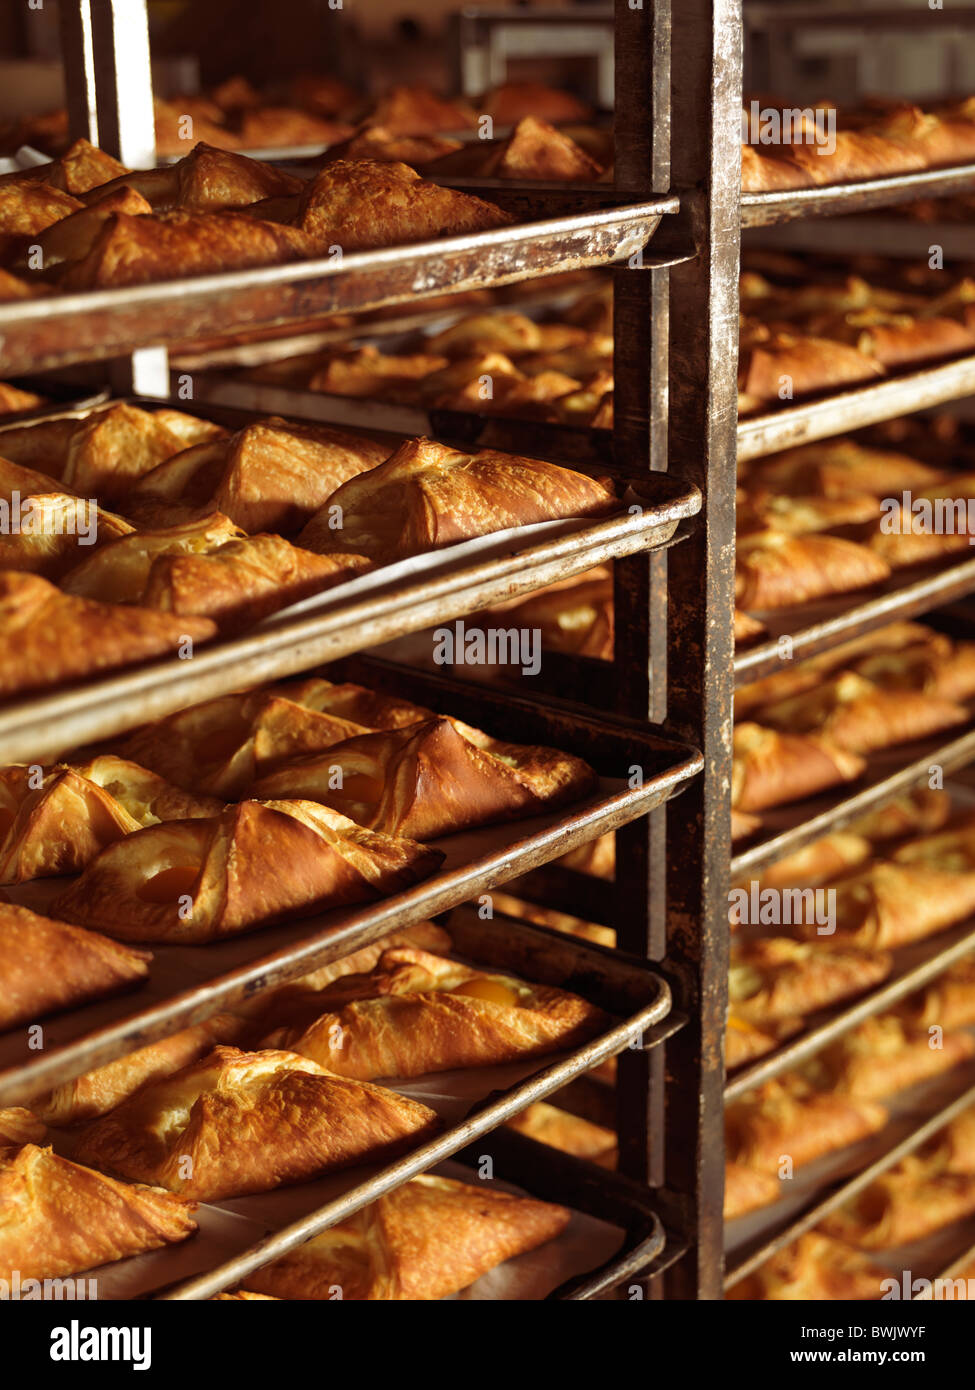 https www alamy com stock photo freshly baked pastries on baking trays in bakery rack trolleys 32992275 html